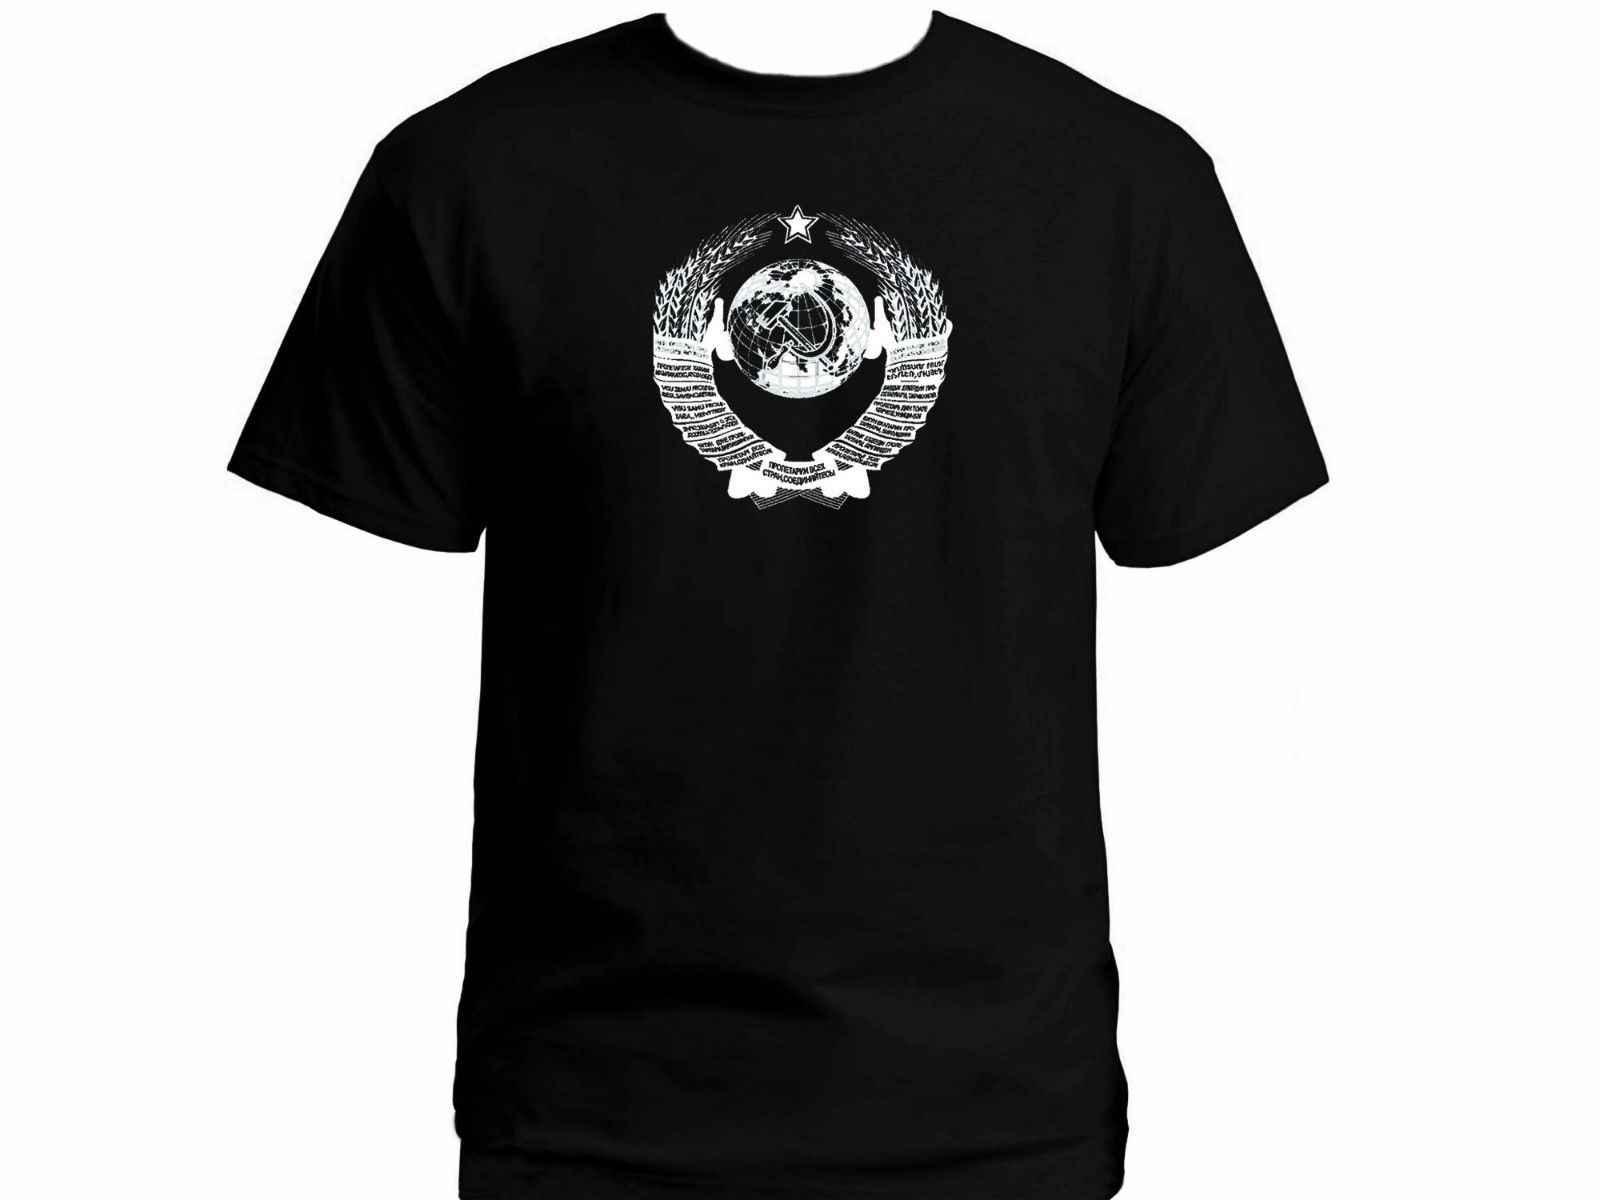 Unión Soviética URSS Cccp Kgb abrigo ruso armas 100% algodón camiseta